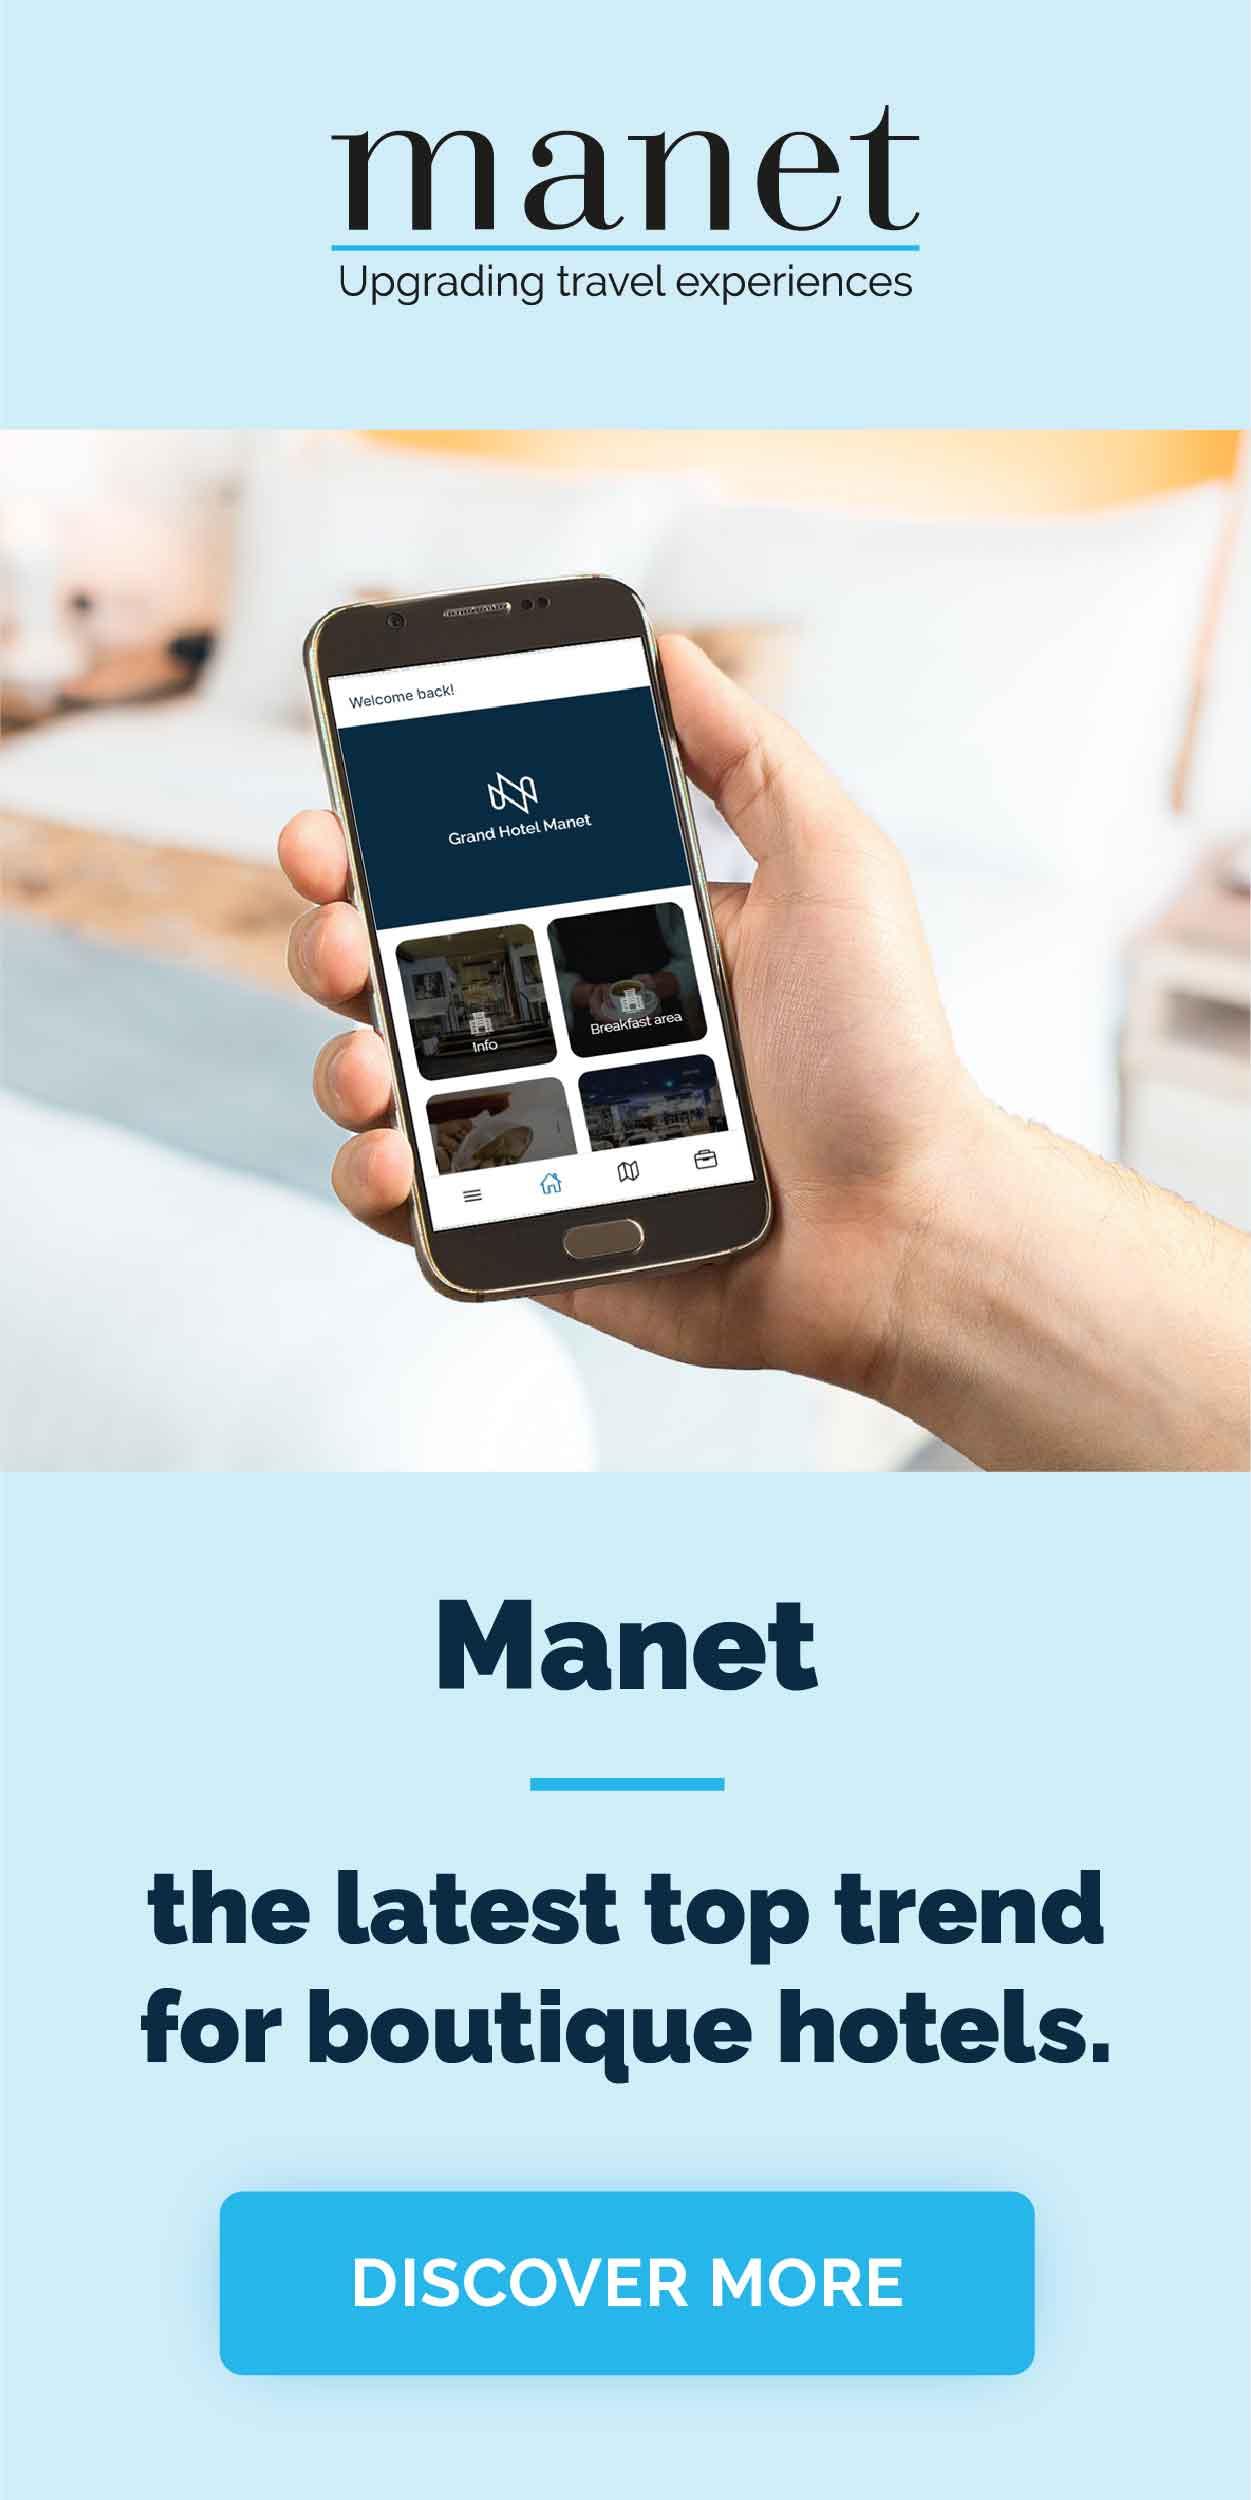 Manet Smart Mobile Travel Assistant for Boutique Hotels